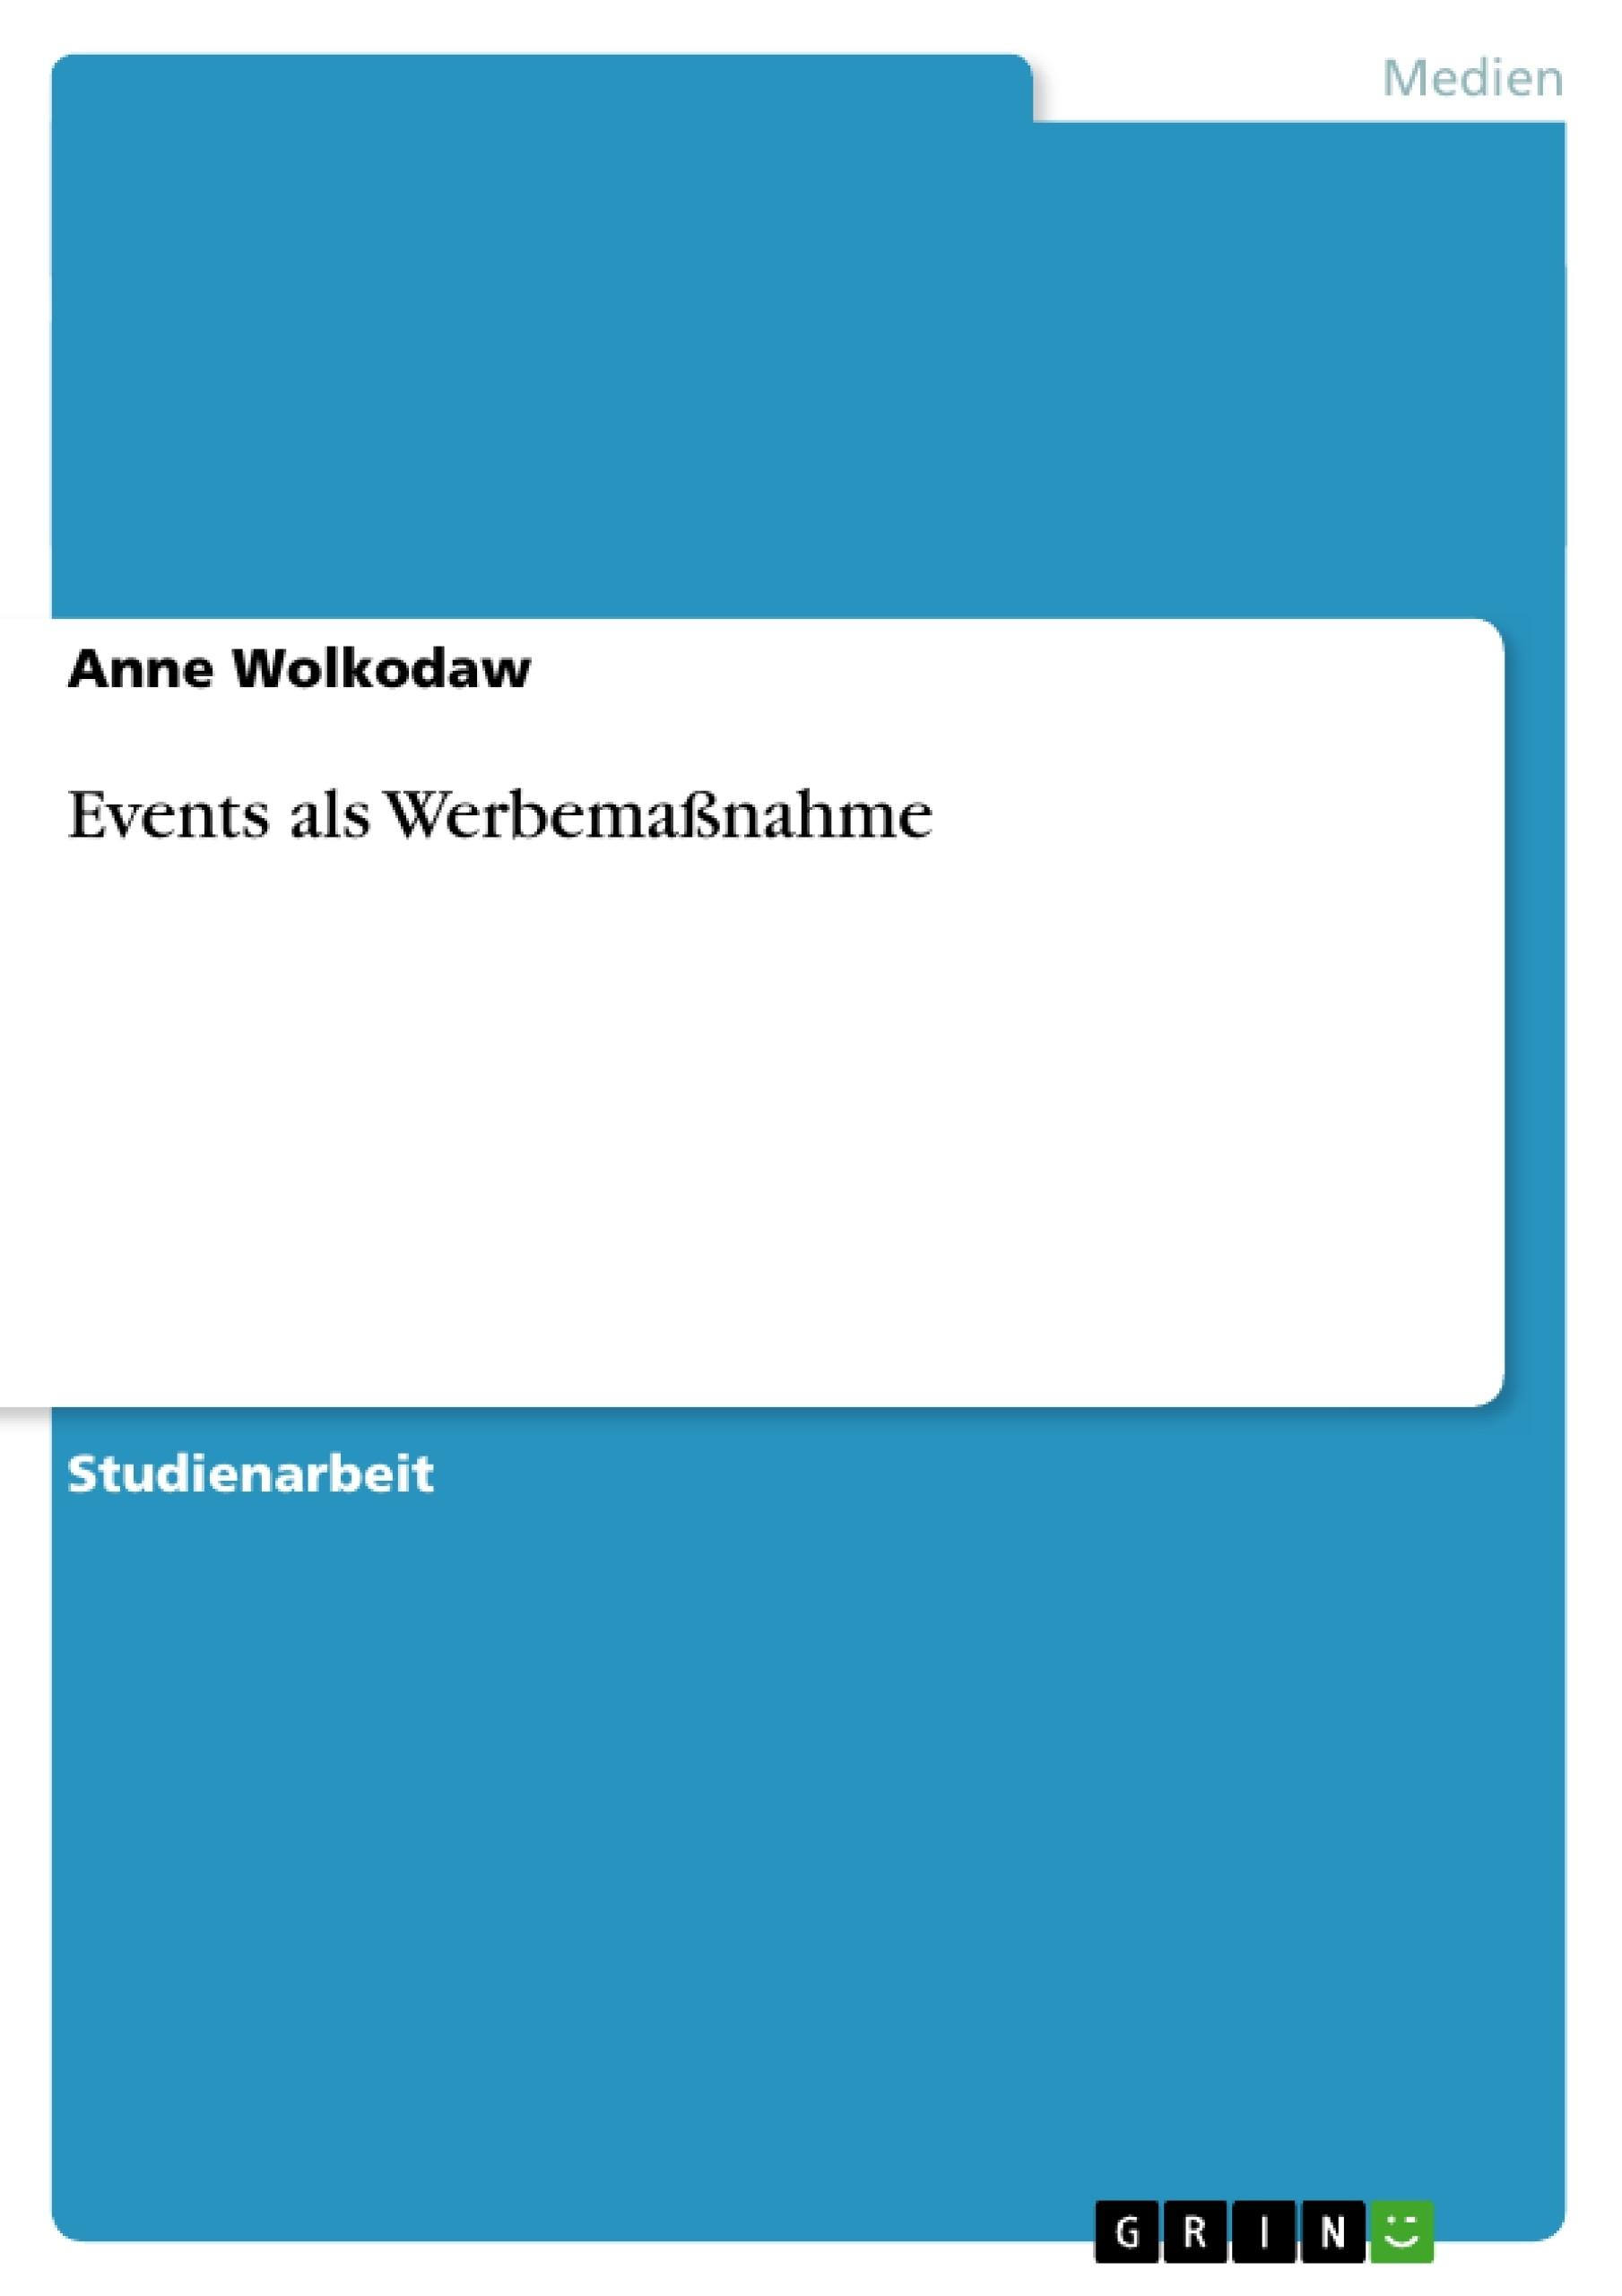 Titel: Events als Werbemaßnahme